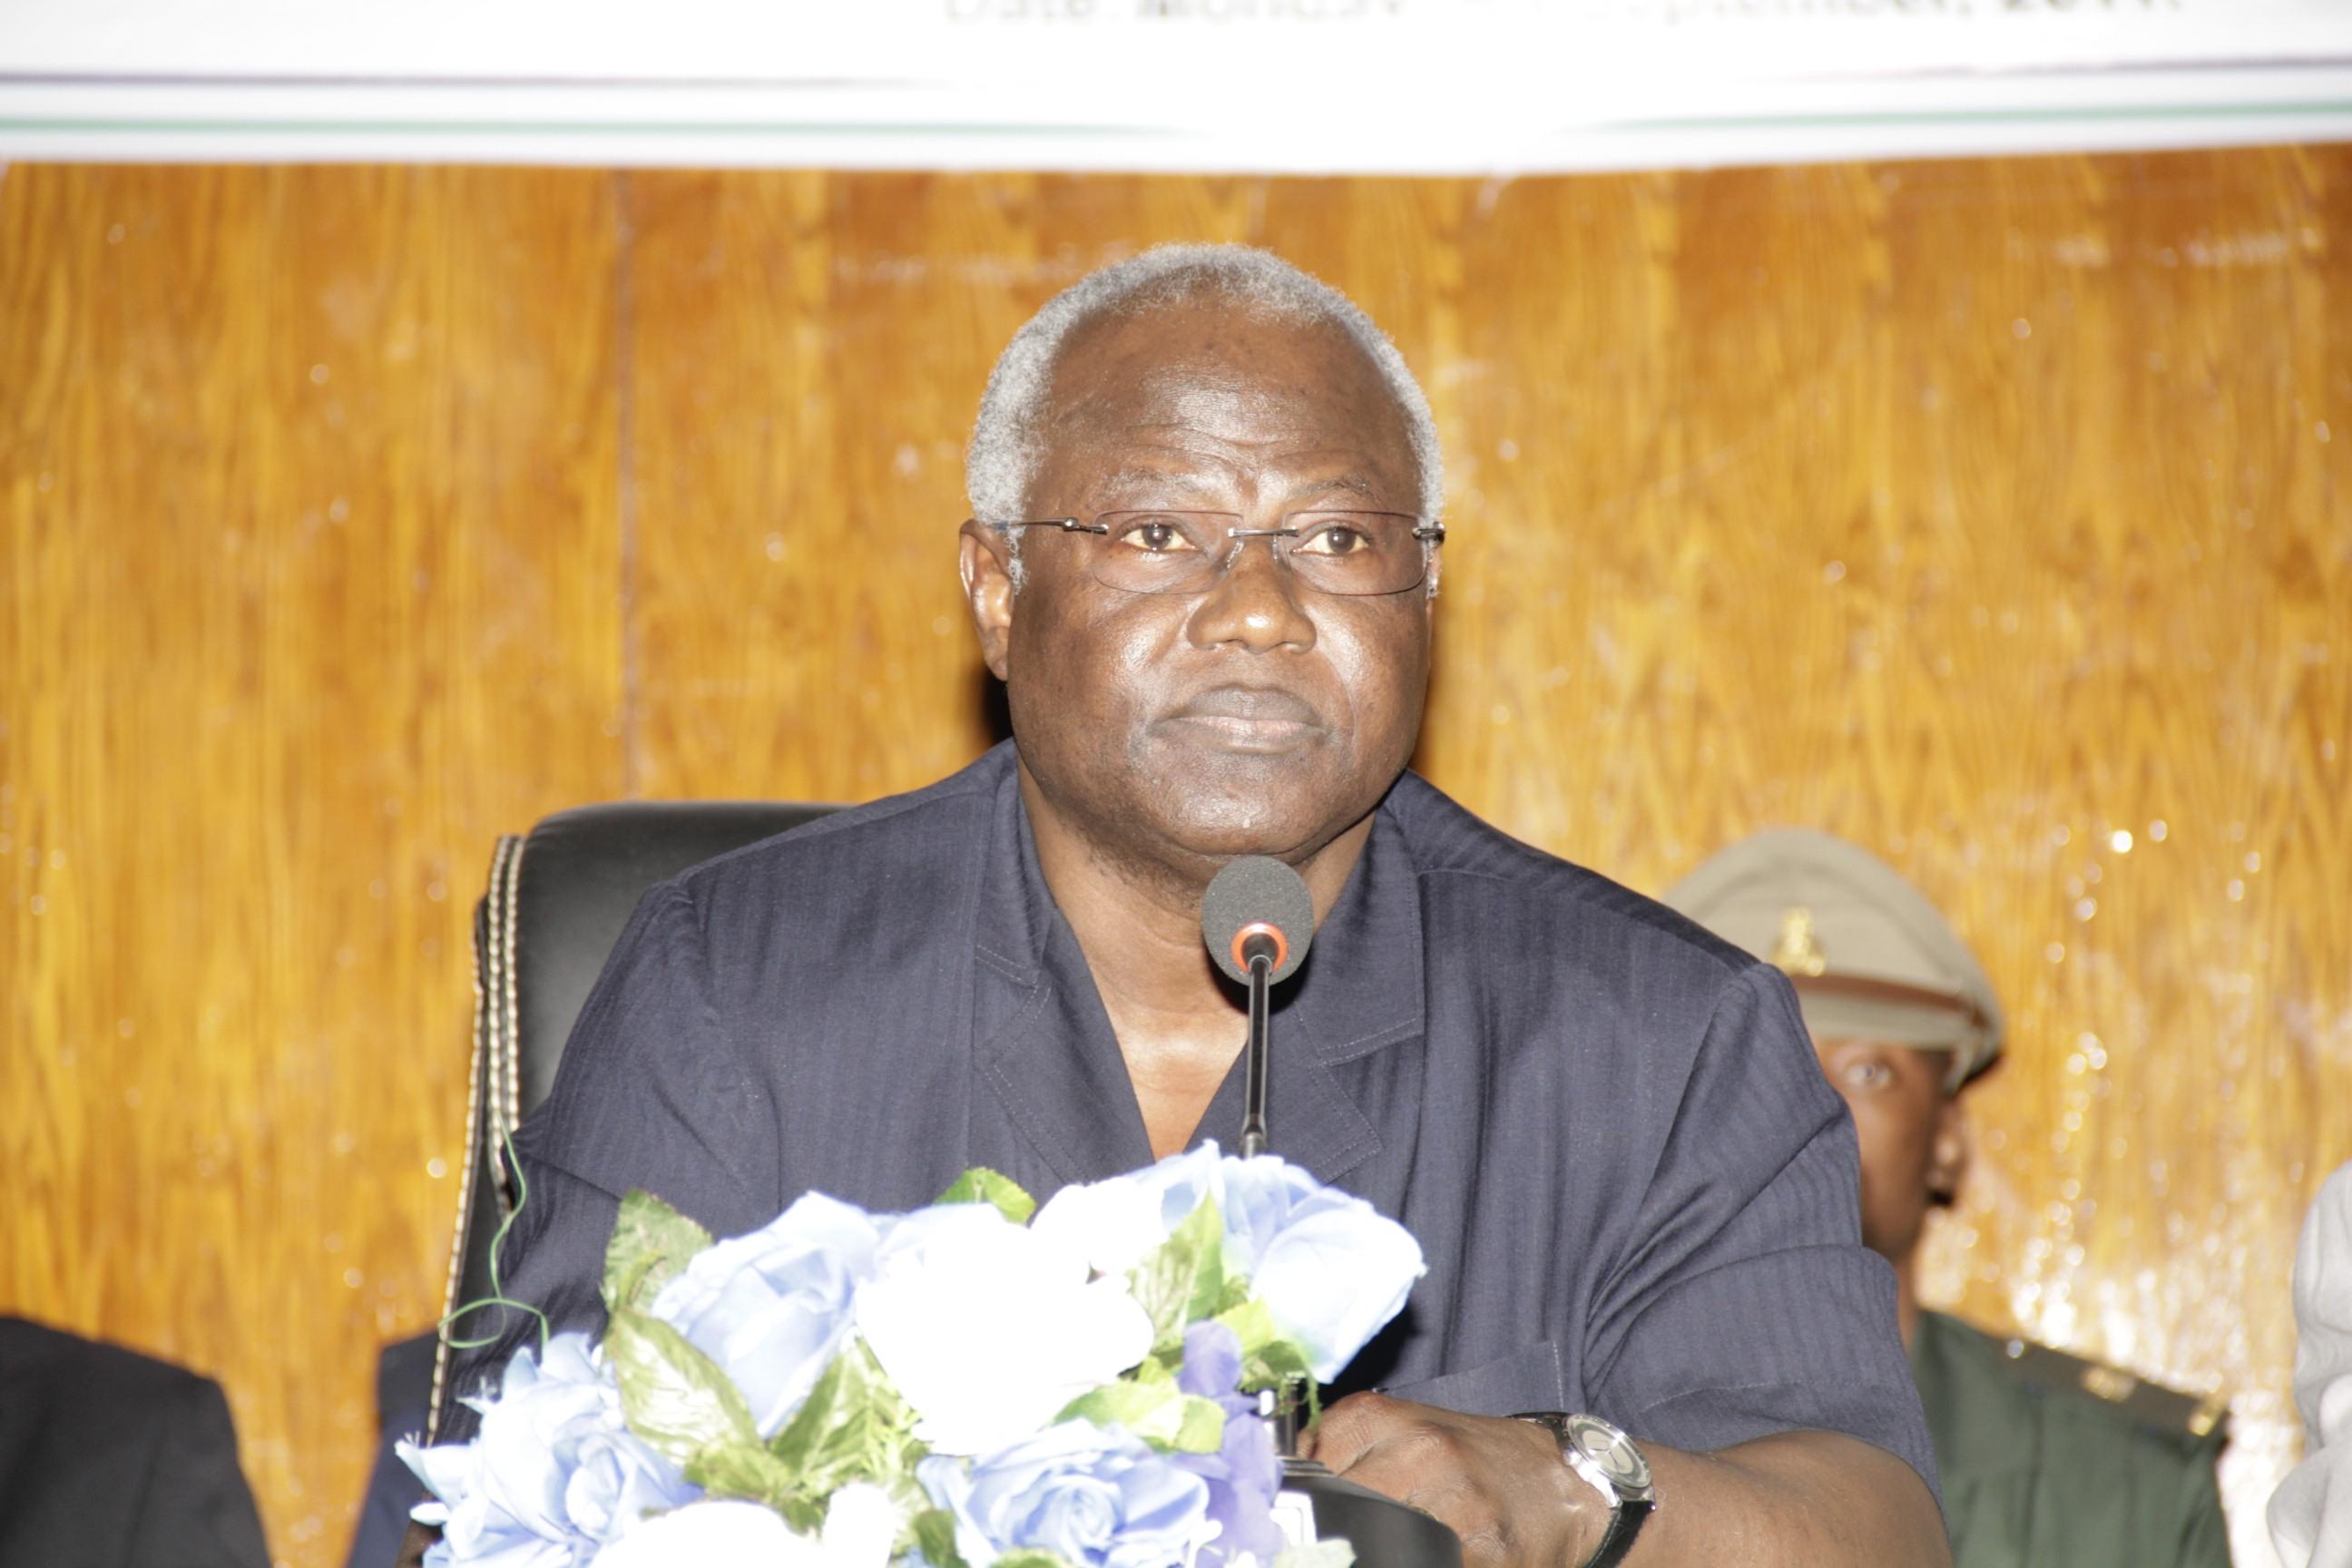 PRESEIDENT KOROMA SPEAKS ABOUT VIOLENCE SEPT 2011